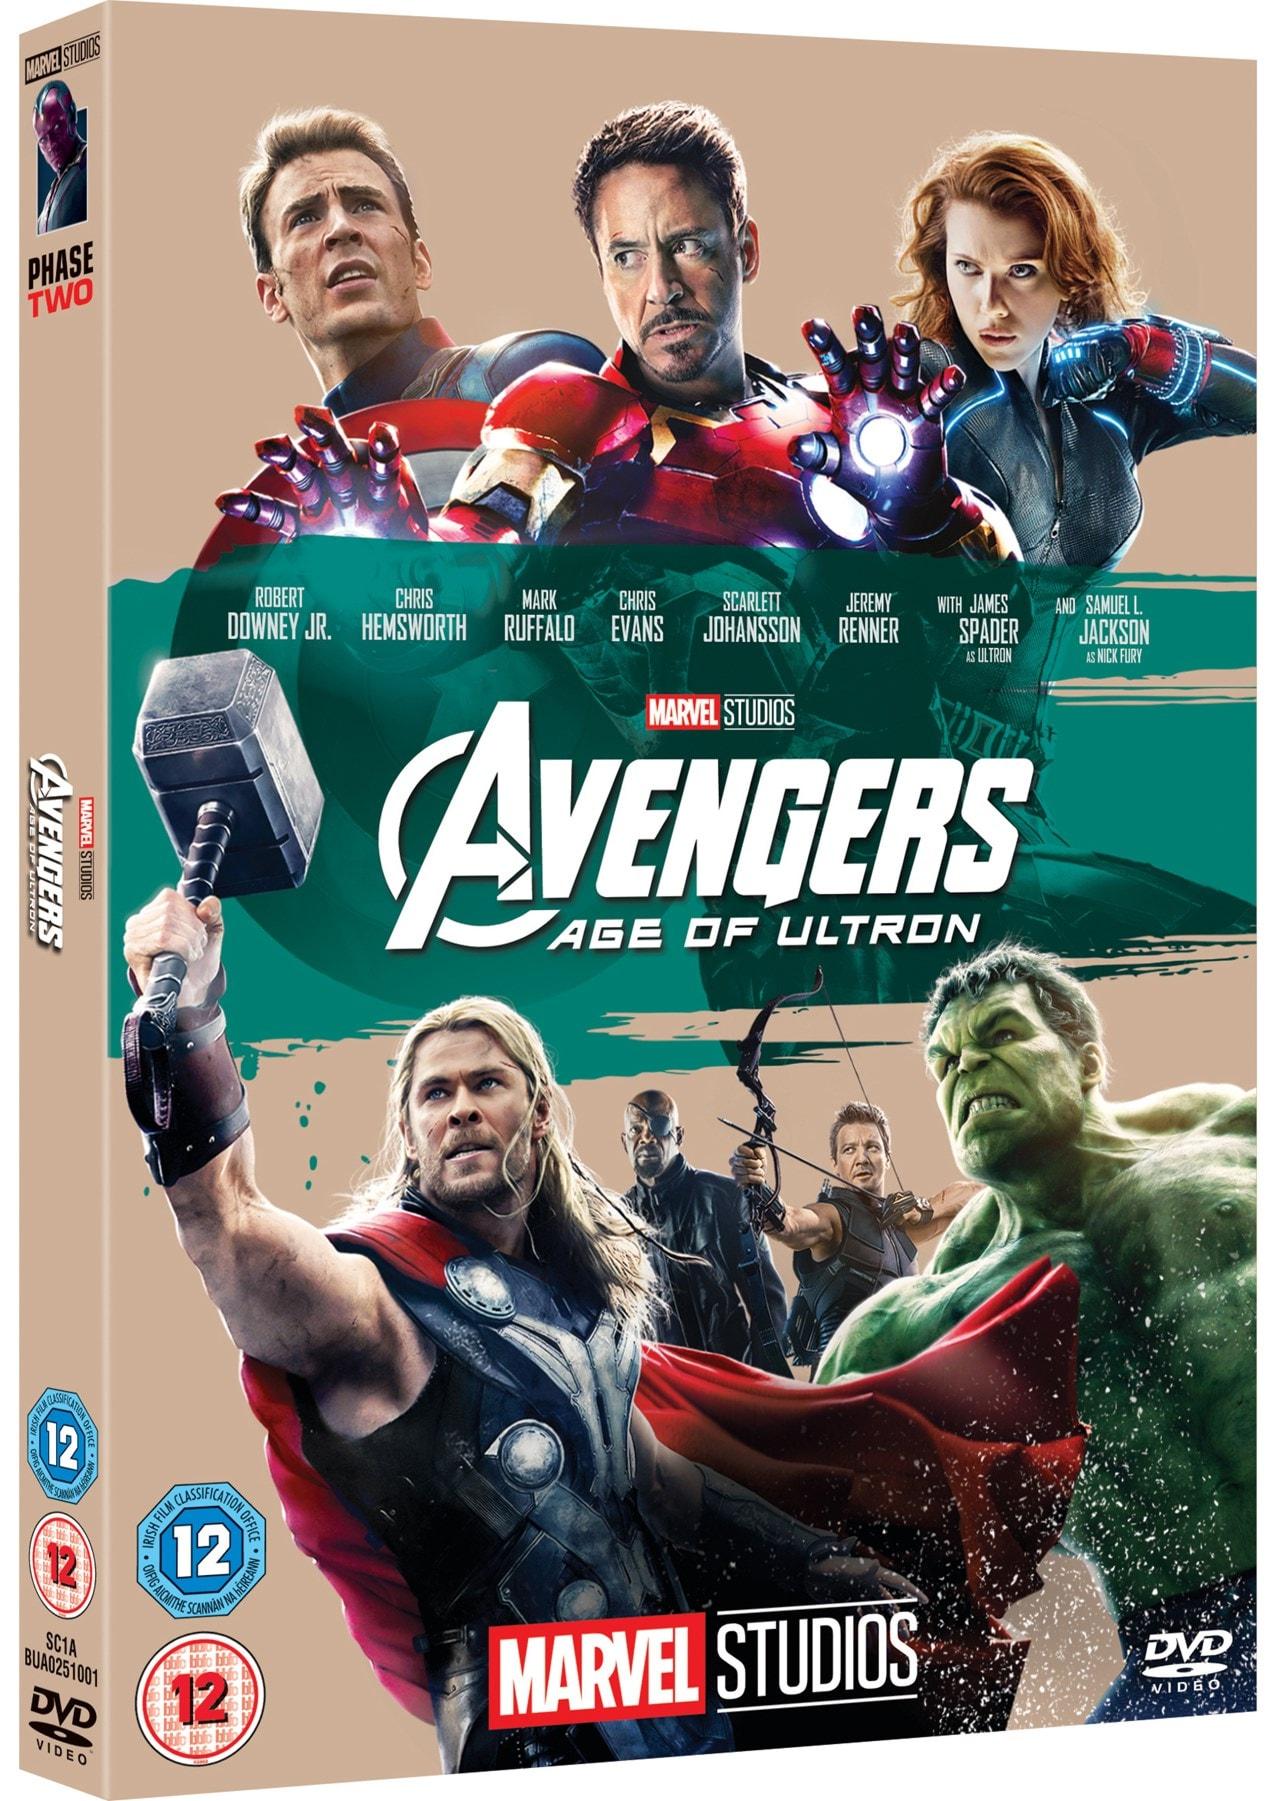 Avengers: Age of Ultron - 2